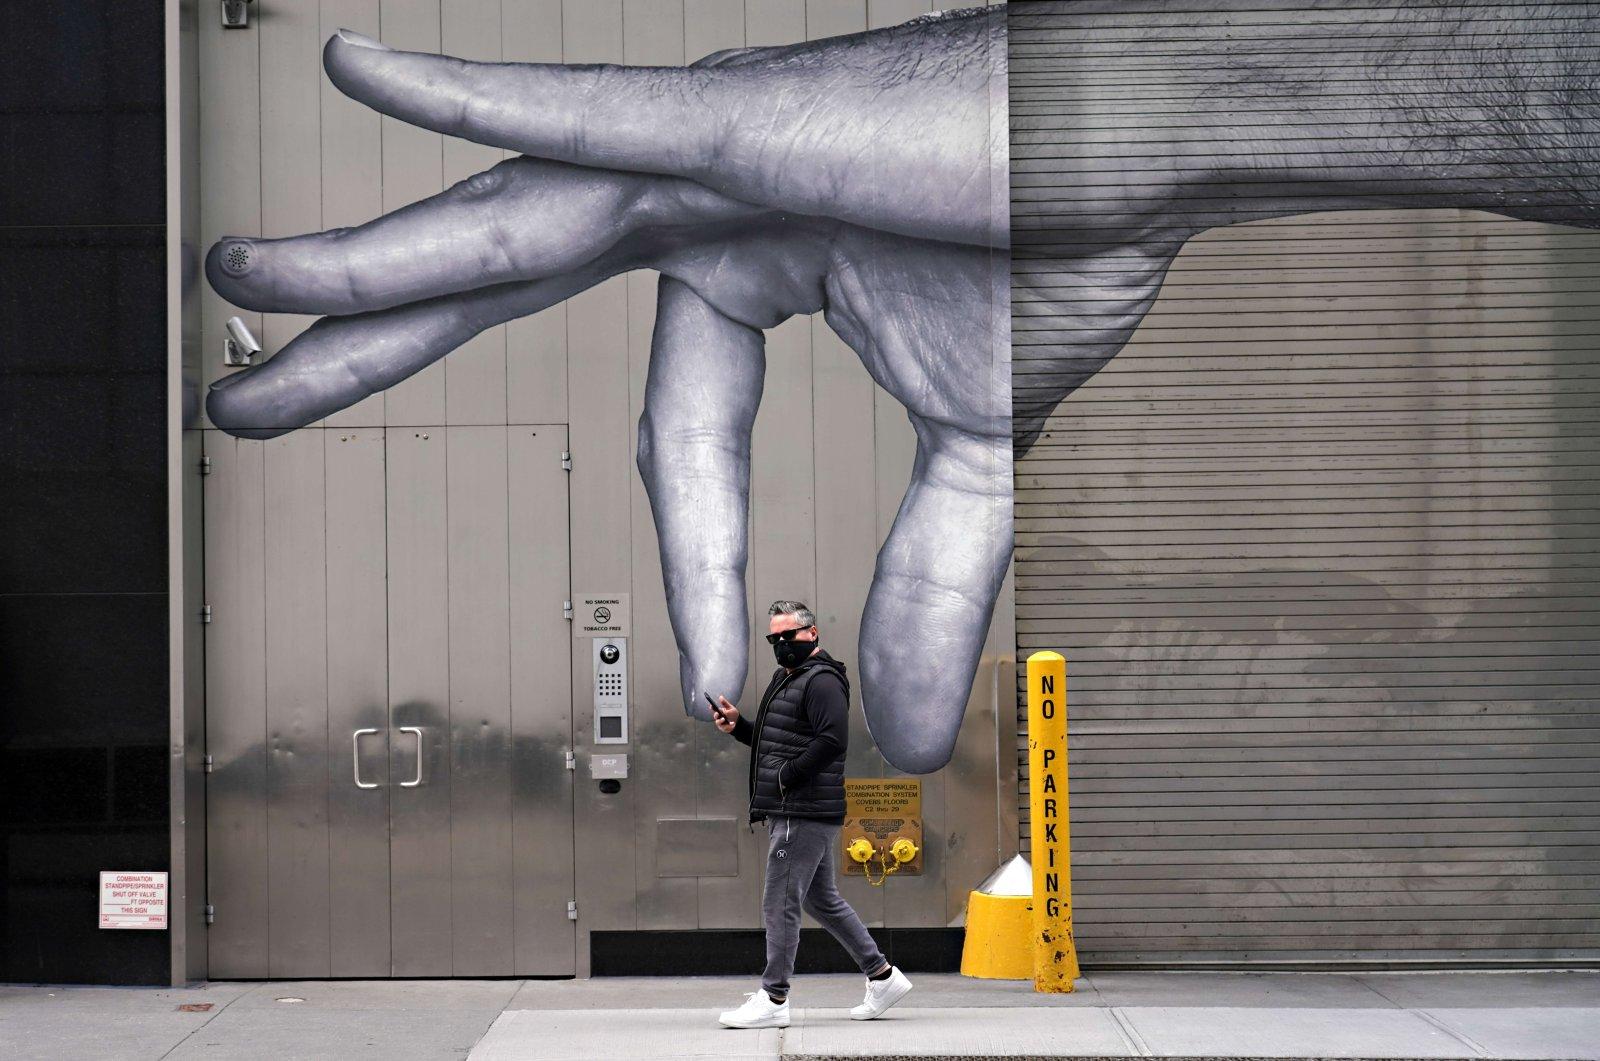 A man wearing a protective mask walks by street art amid the coronavirus pandemic, New York City, Sunday, April 5, 2020. (AFP Photo)